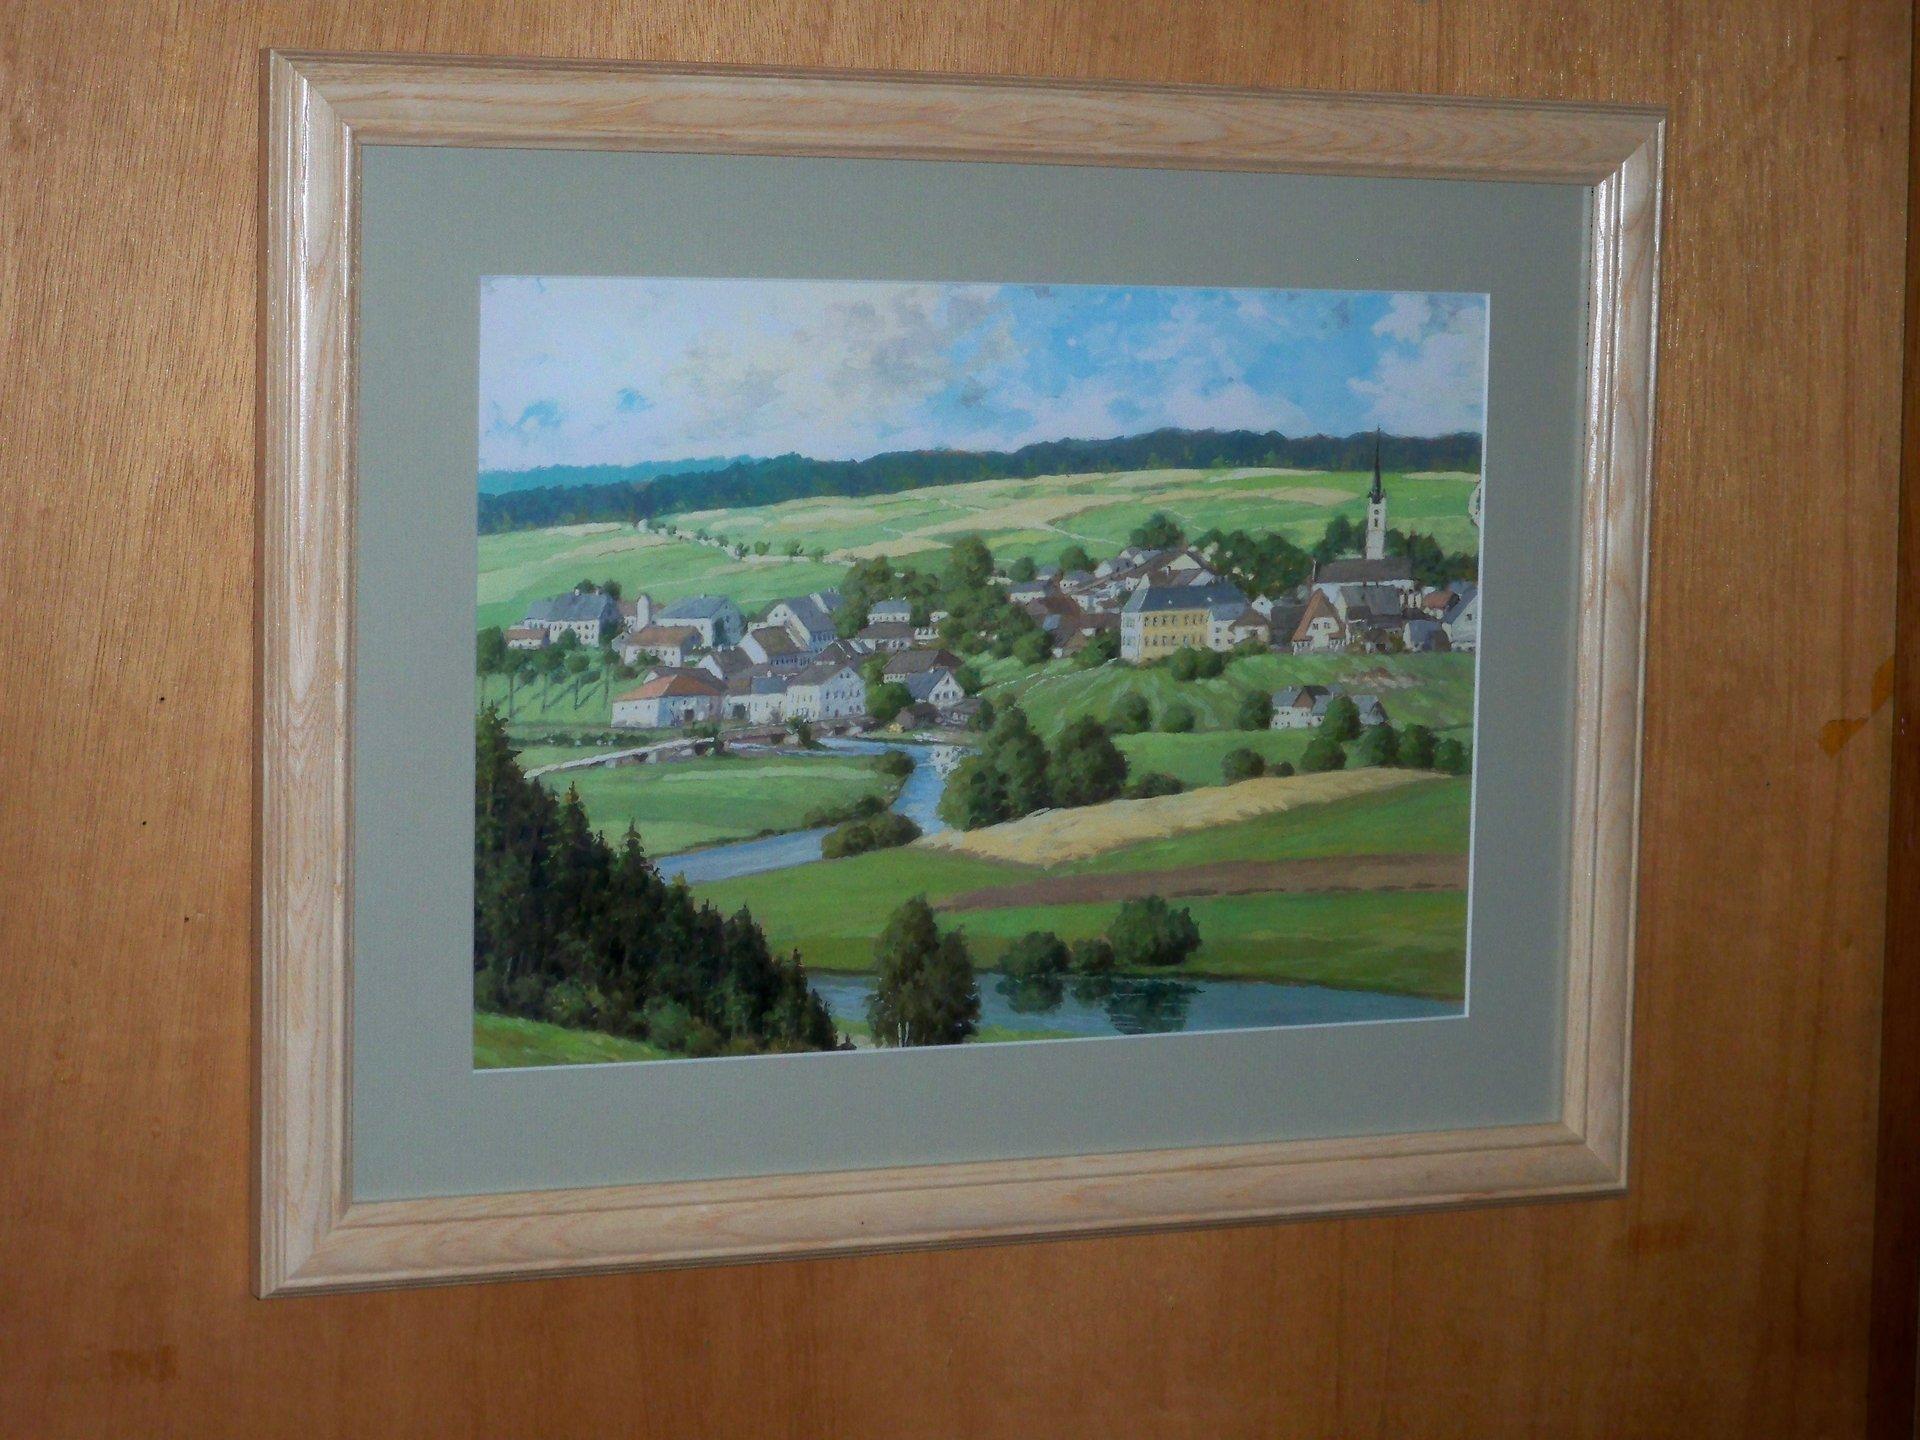 Original art from Austria